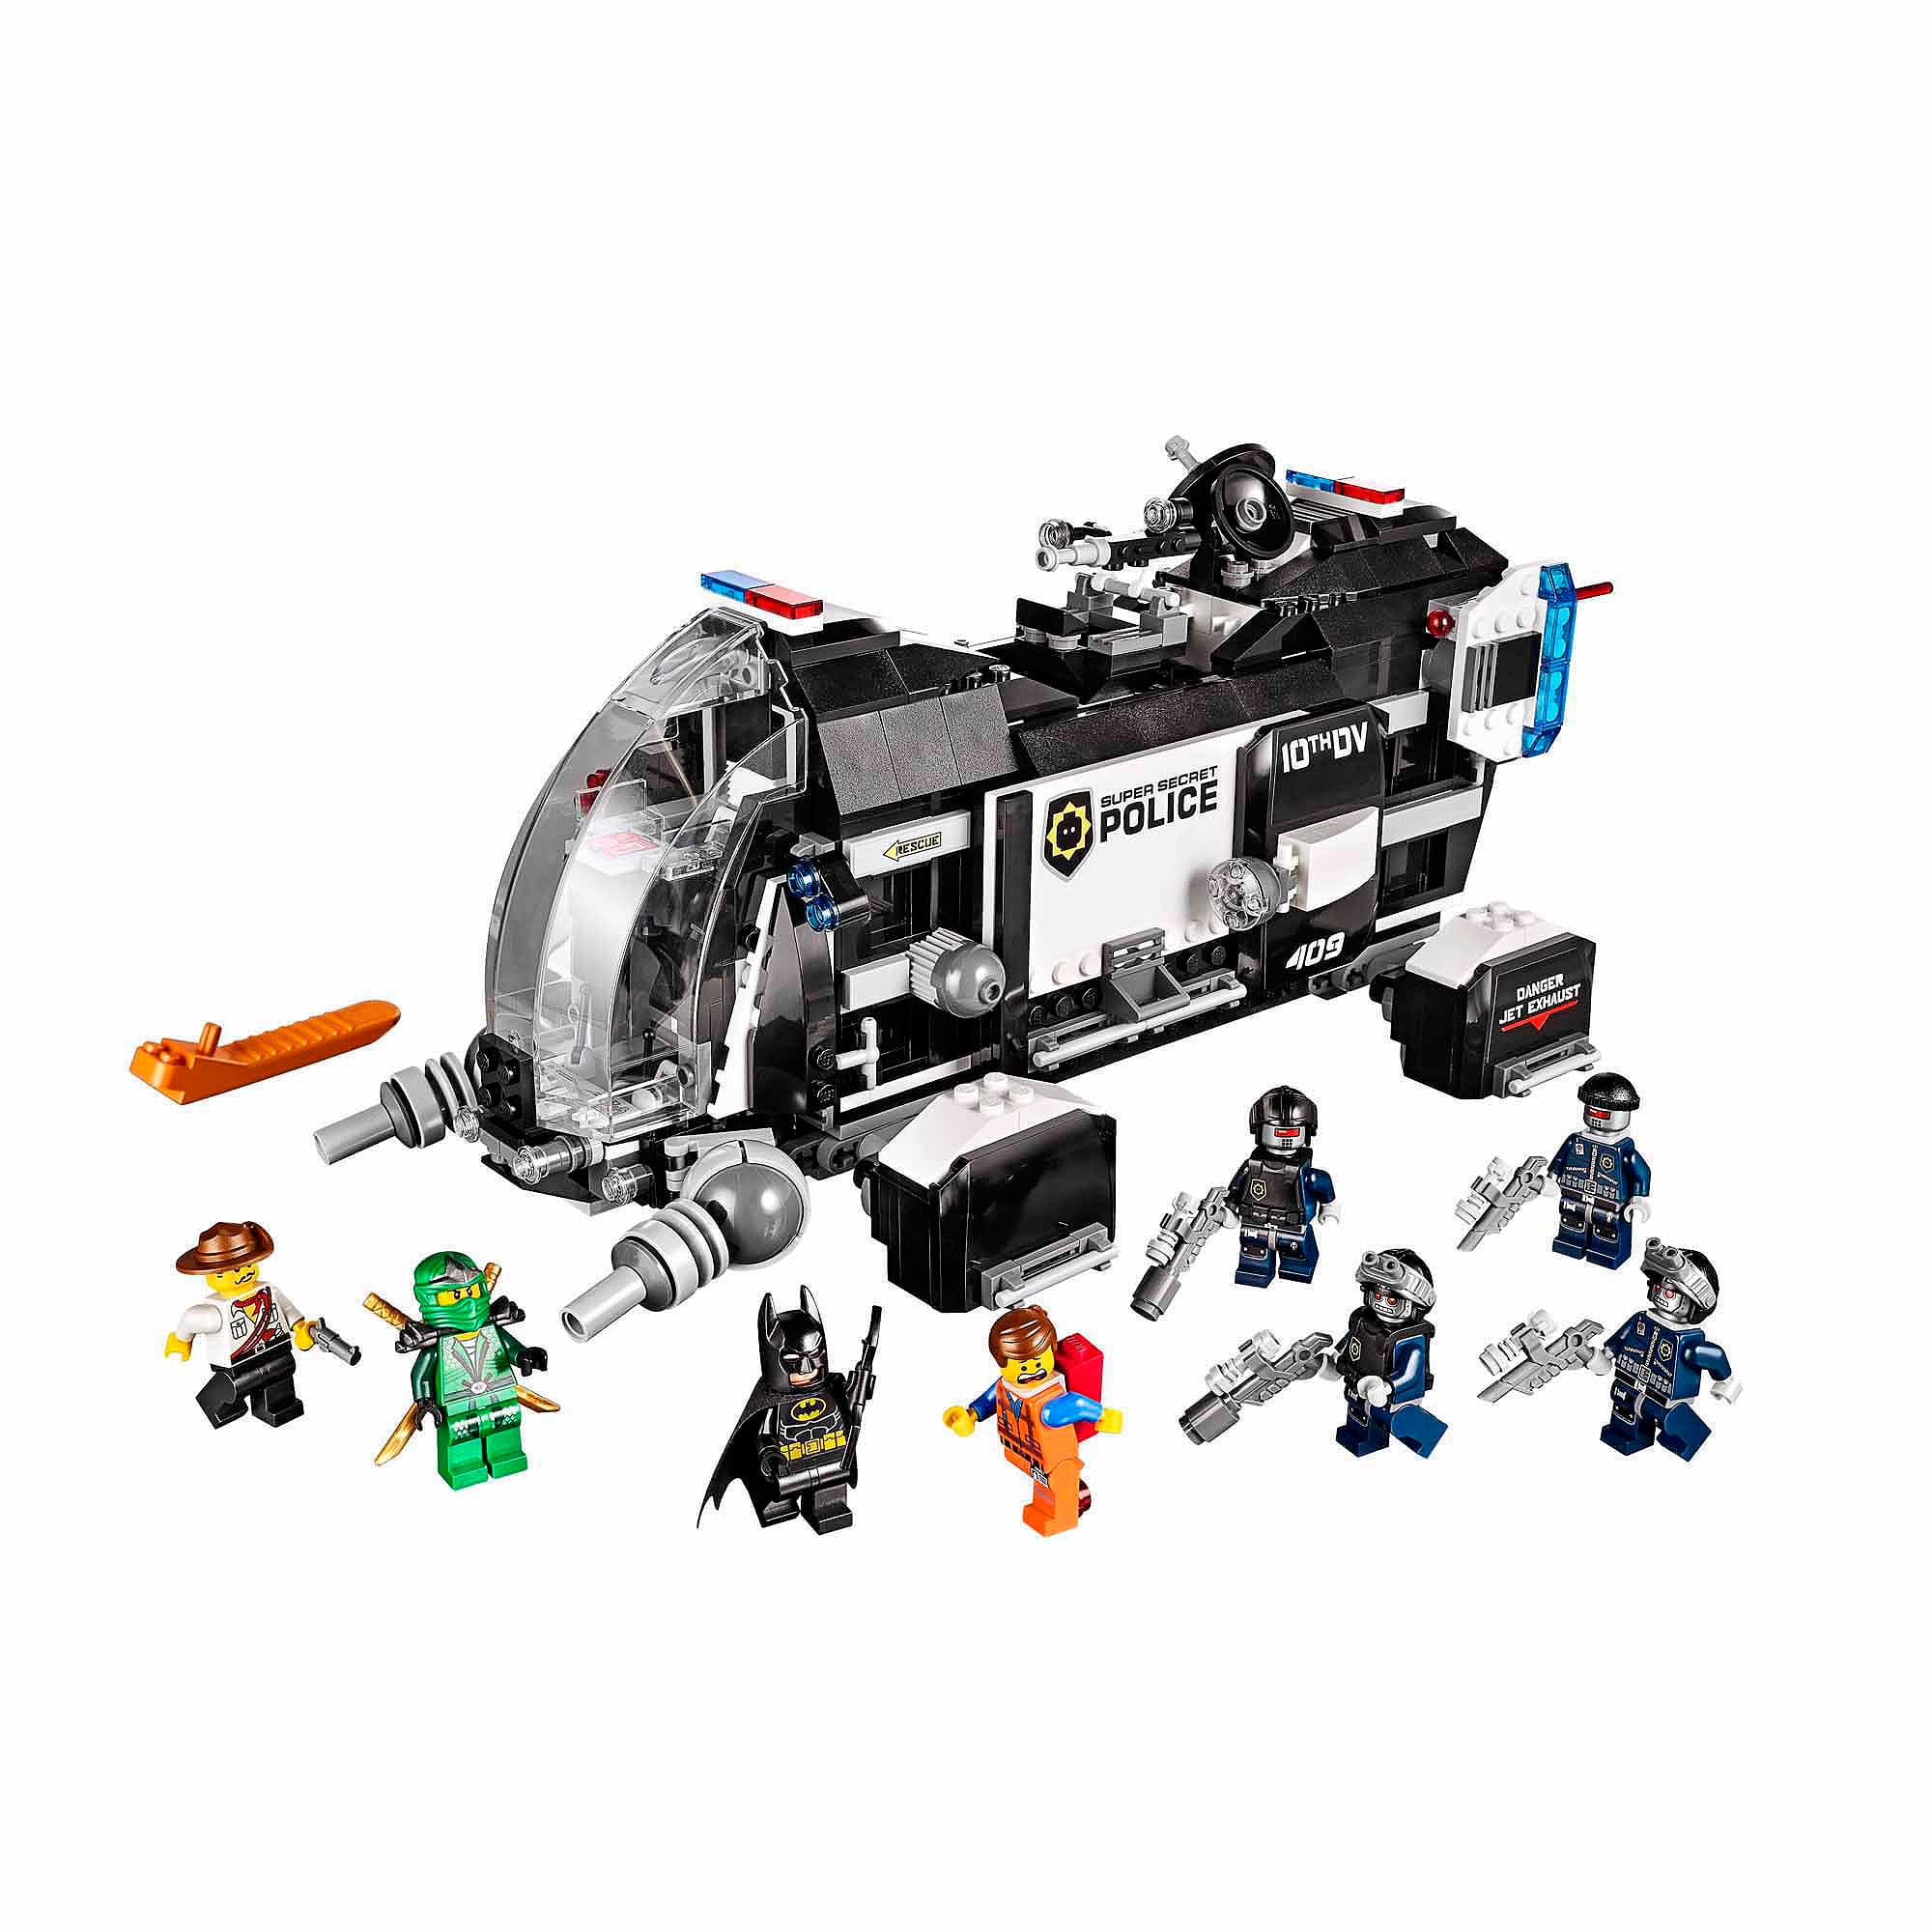 THE Lego MOVIE Super Secret Police Dropship w  8 Minifigures | 70815 by Lego